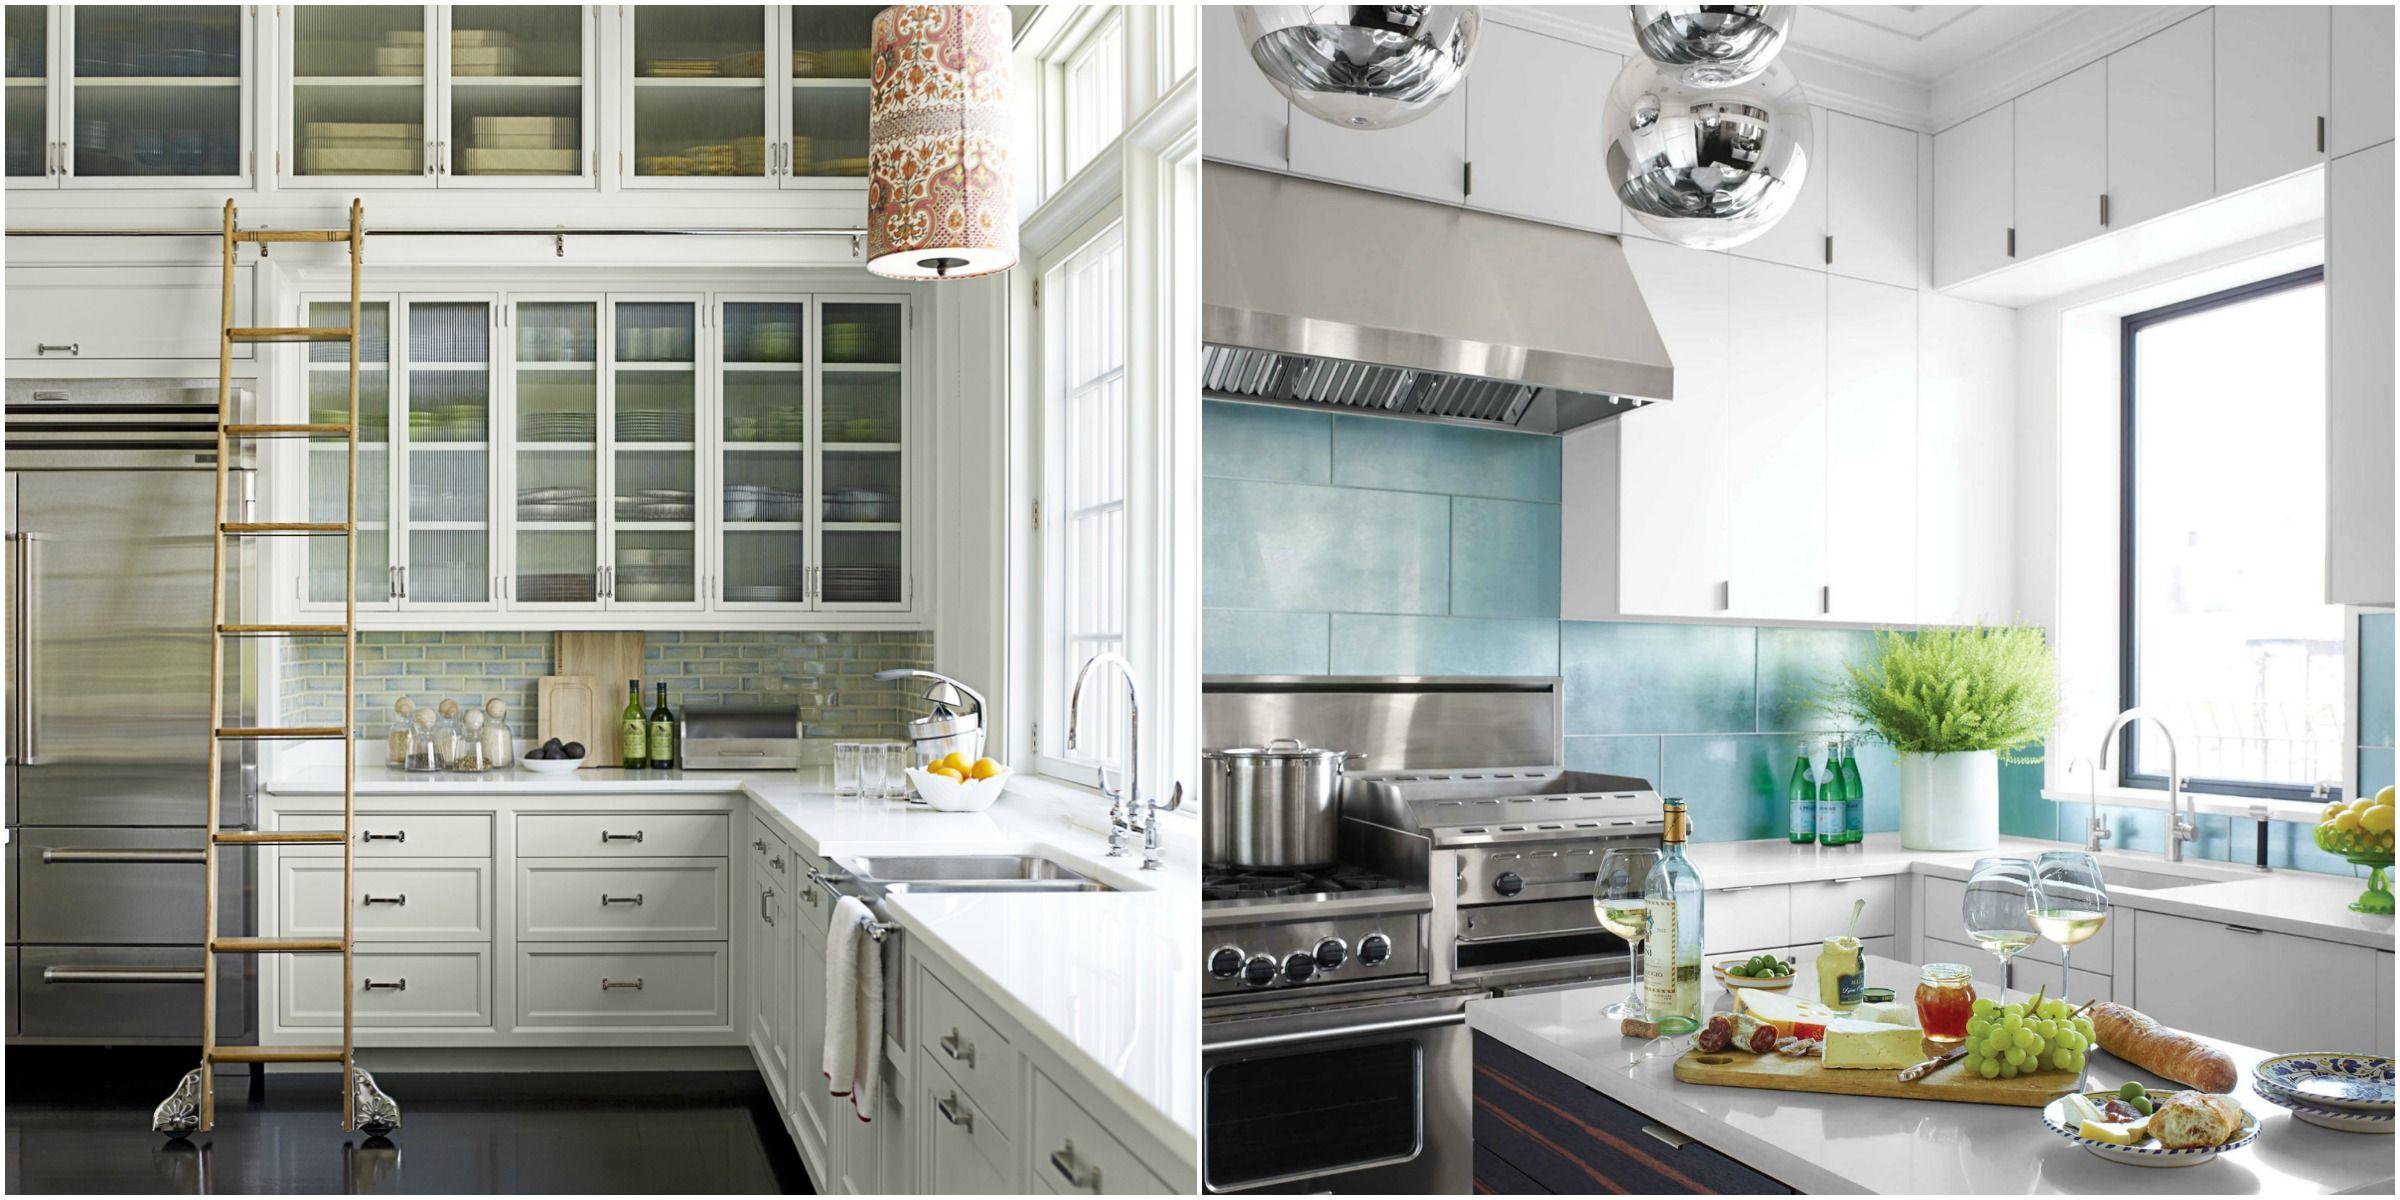 stylish ways to add kitchen style kitchen interior design ideas